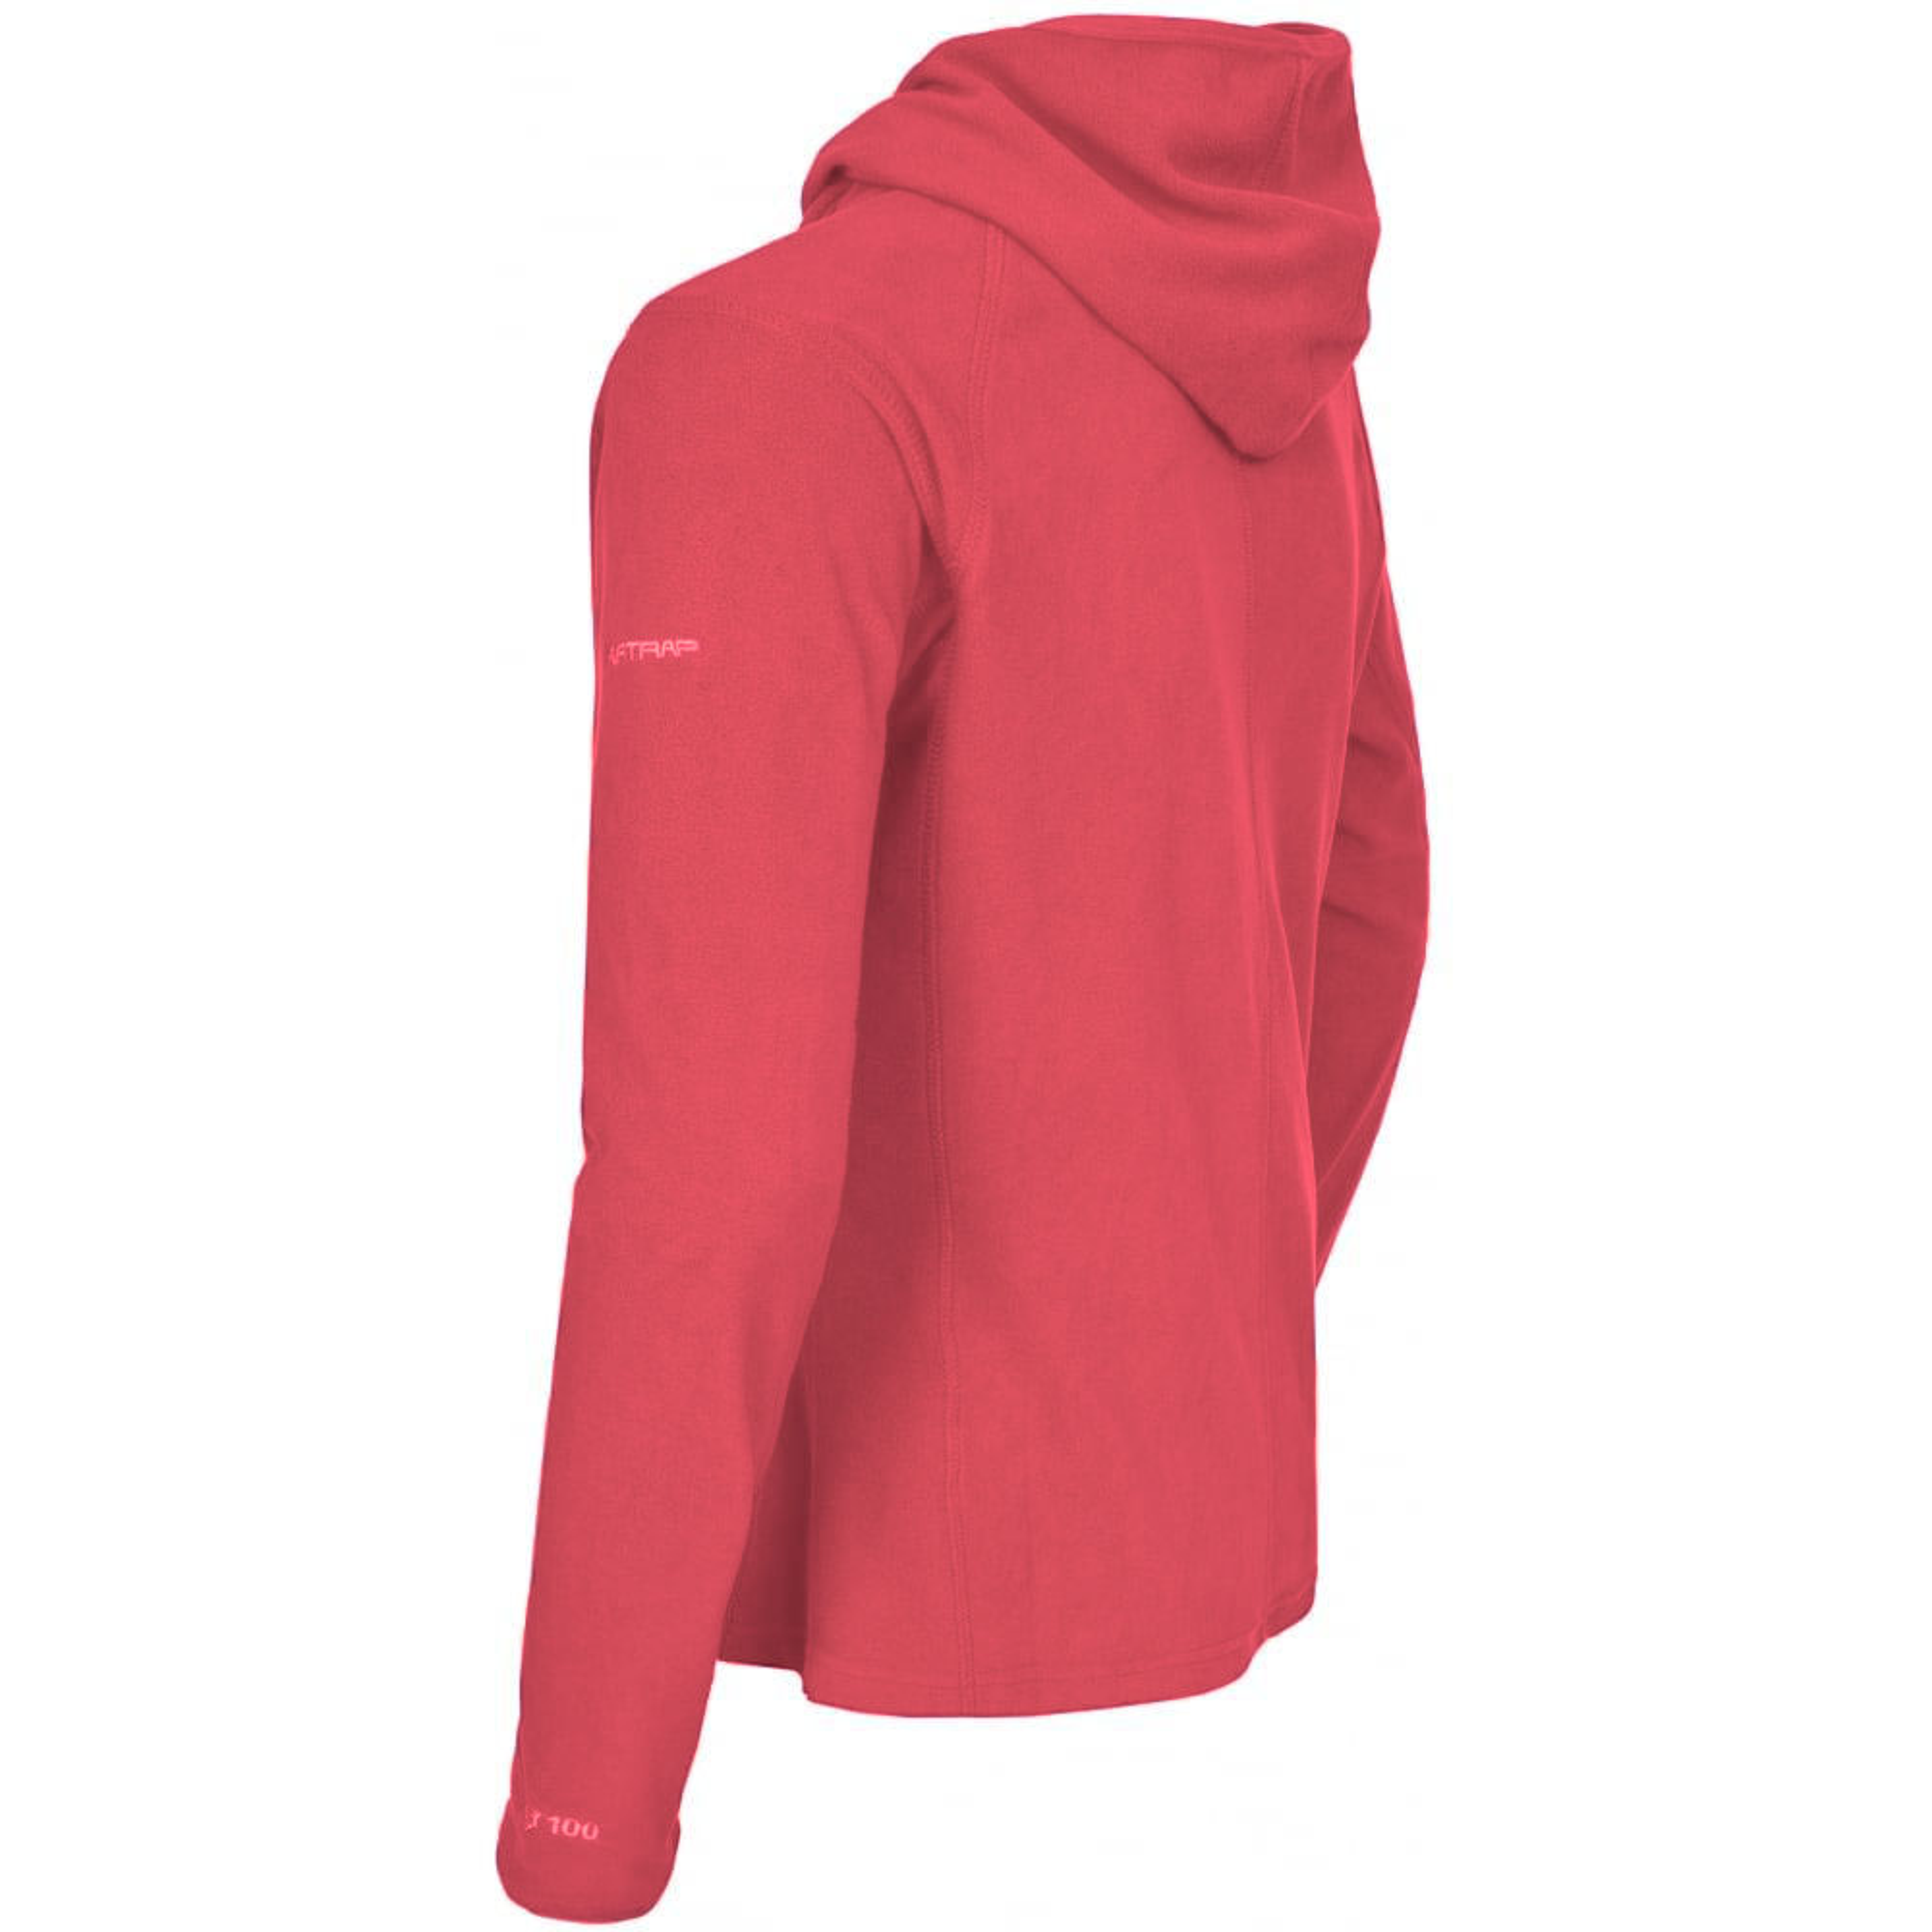 Trespass Womens/Ladies Marathon Hooded Full Zip Fleece Jacket (XS) (Blackcurrant)